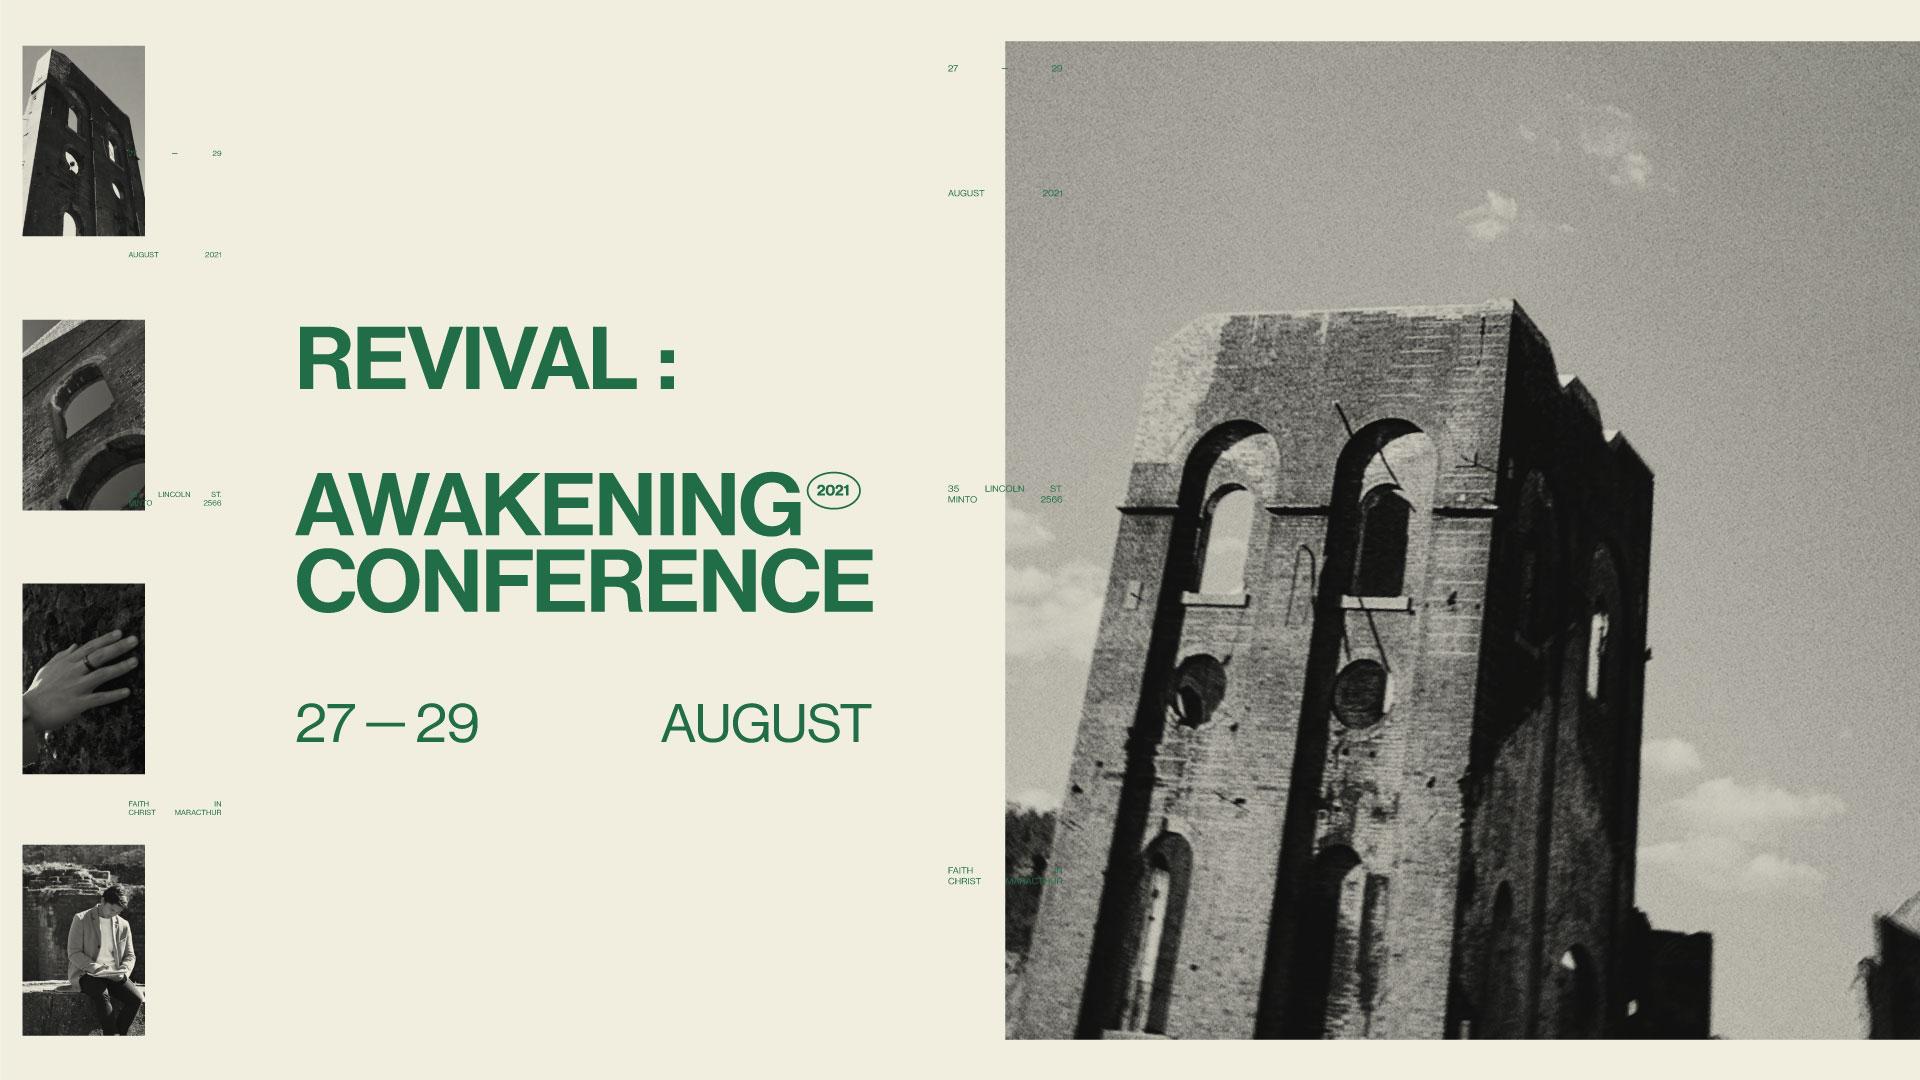 Awakening Conference Website Banner